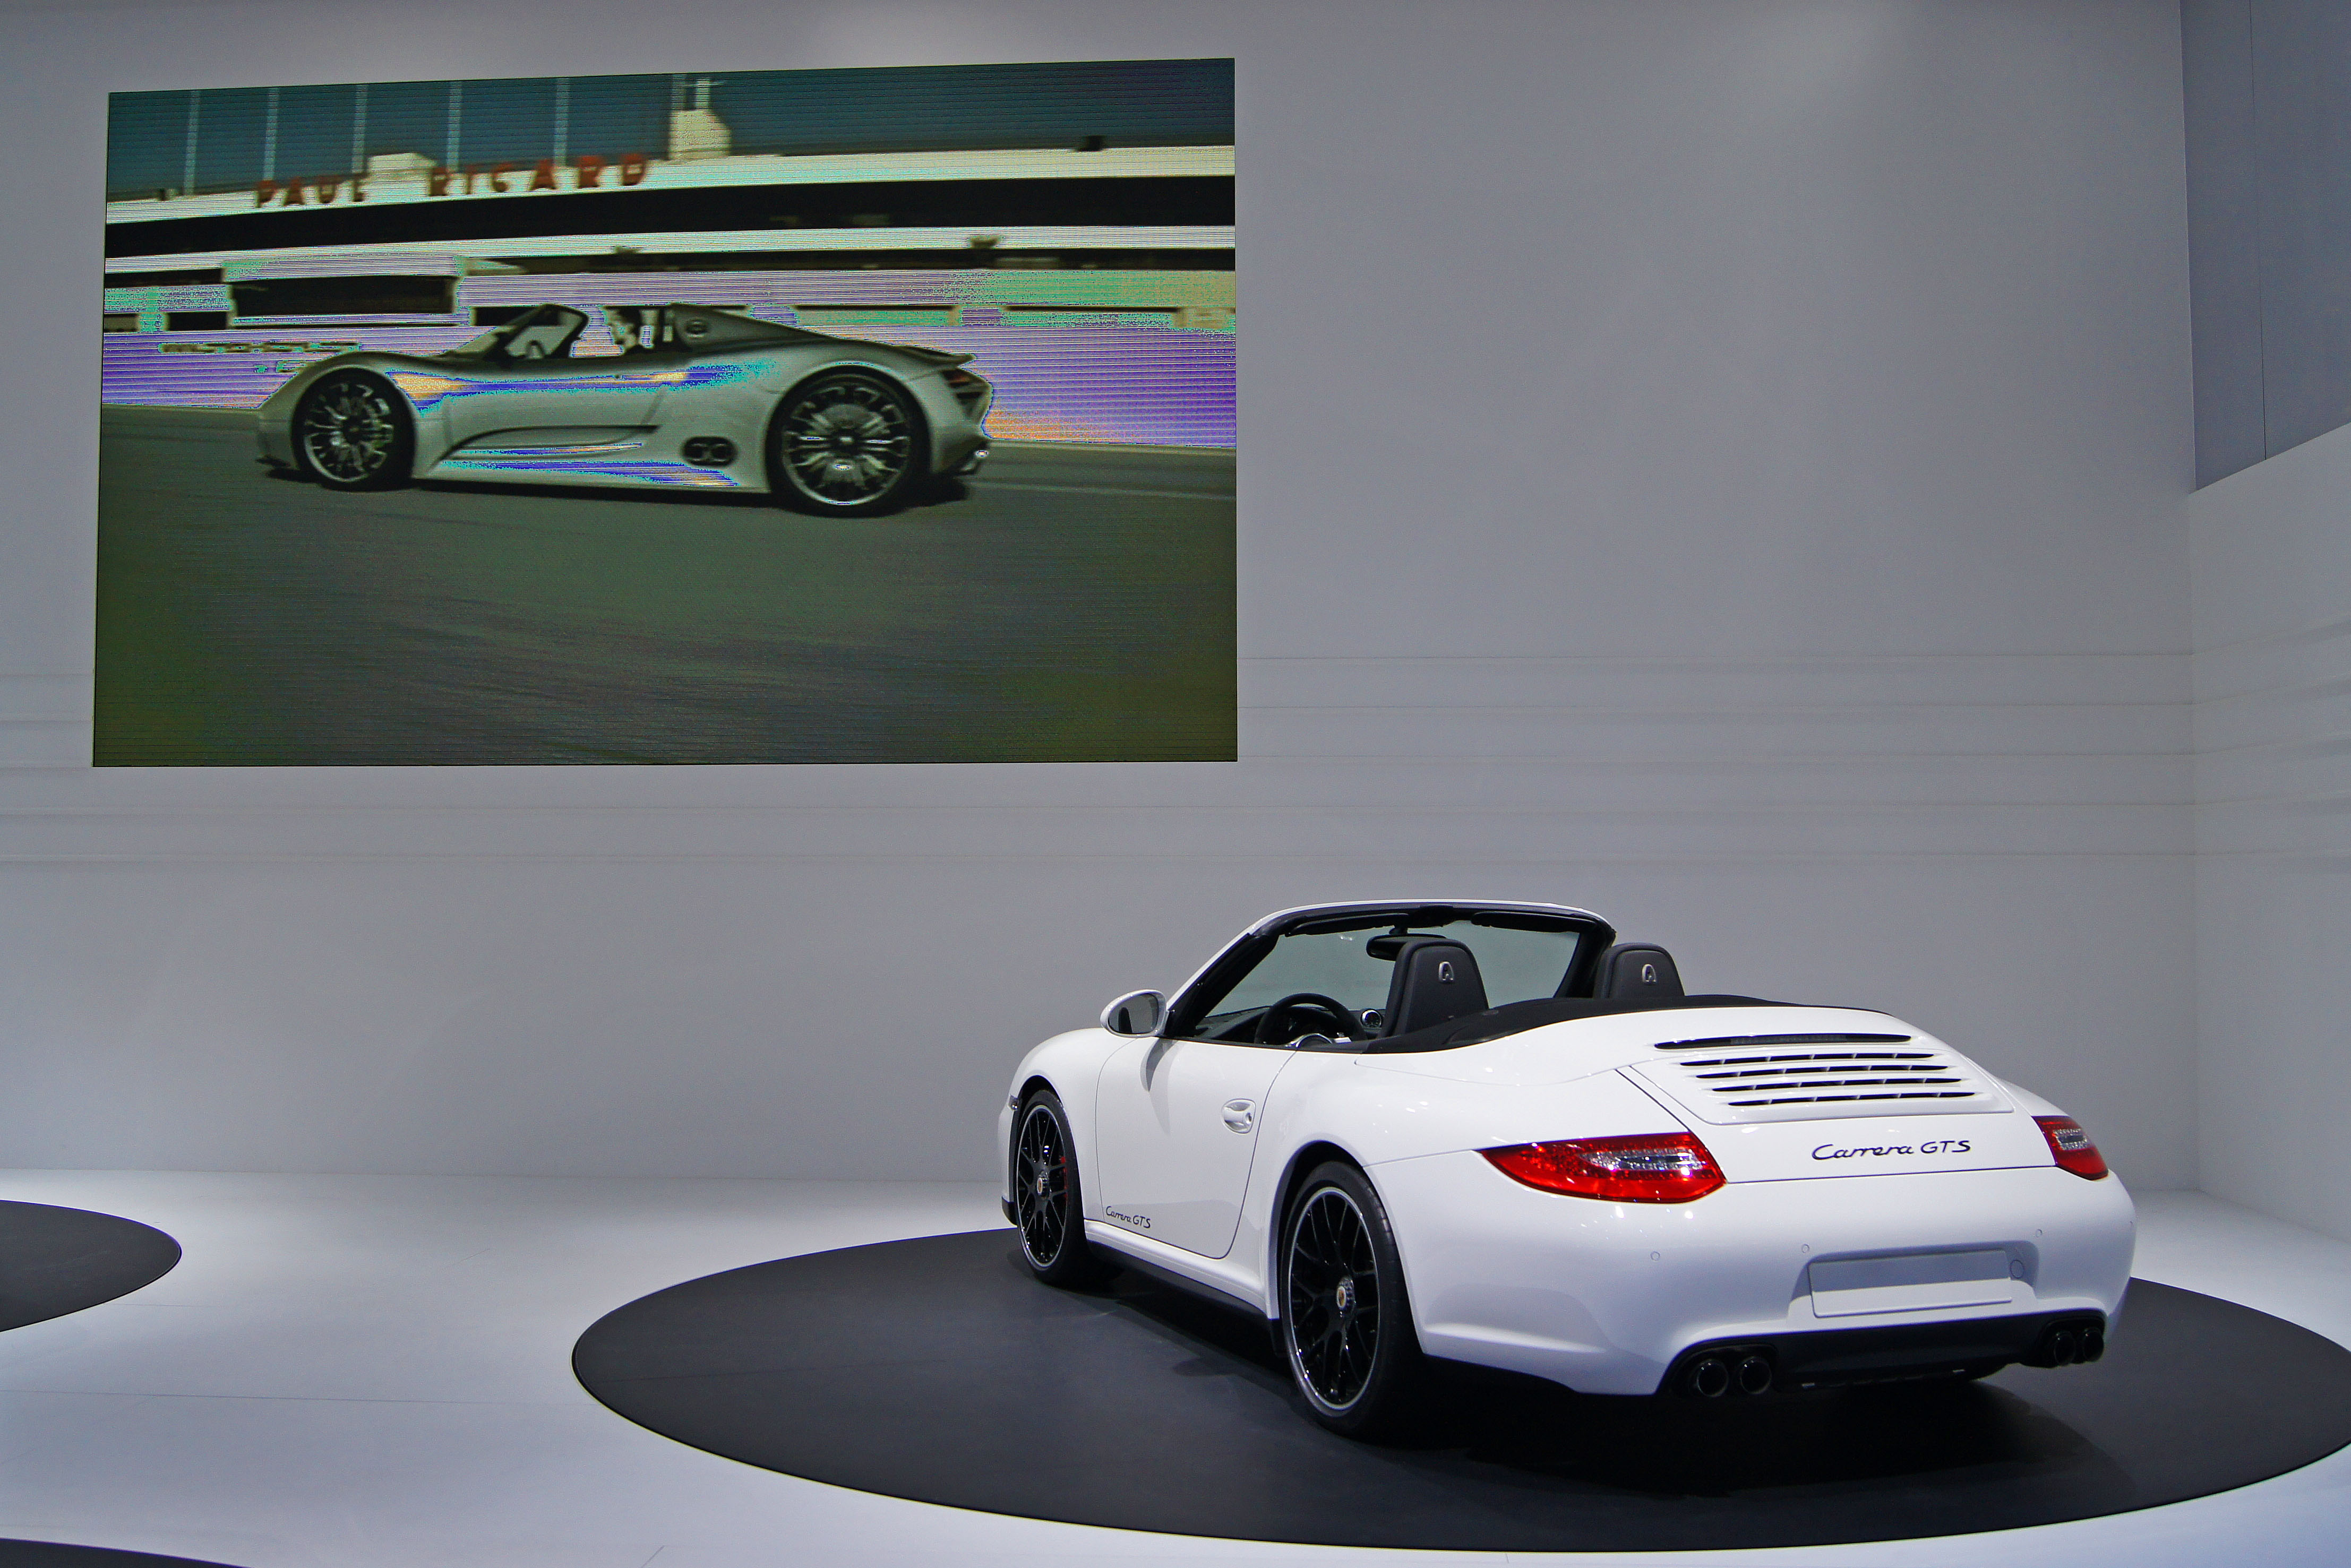 997-Carrera-GTS-Cabriolet-